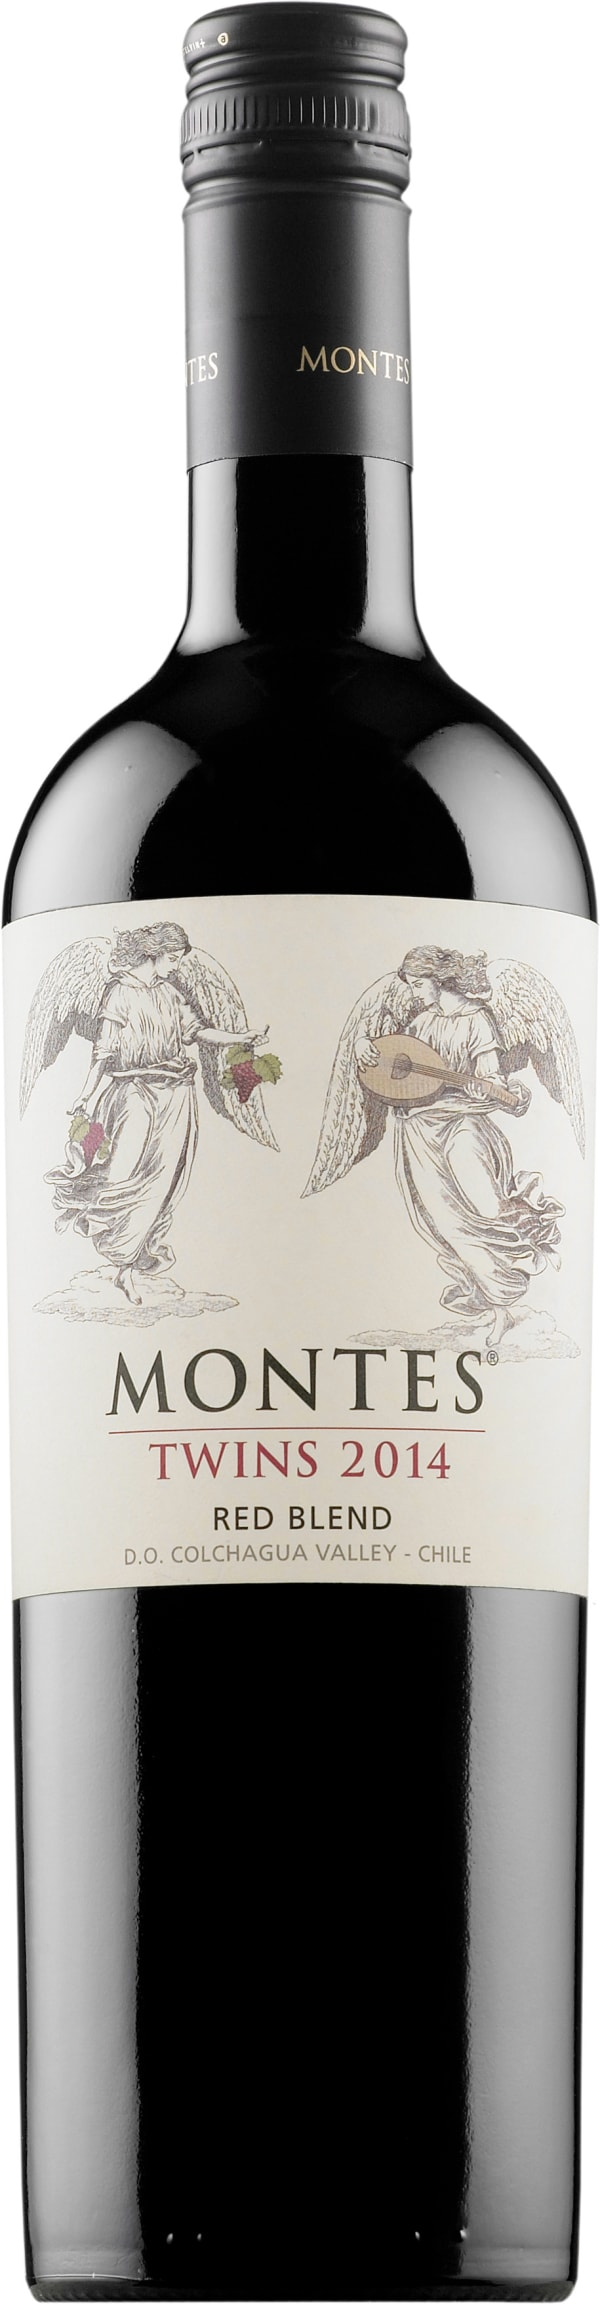 Montes Twins 2017